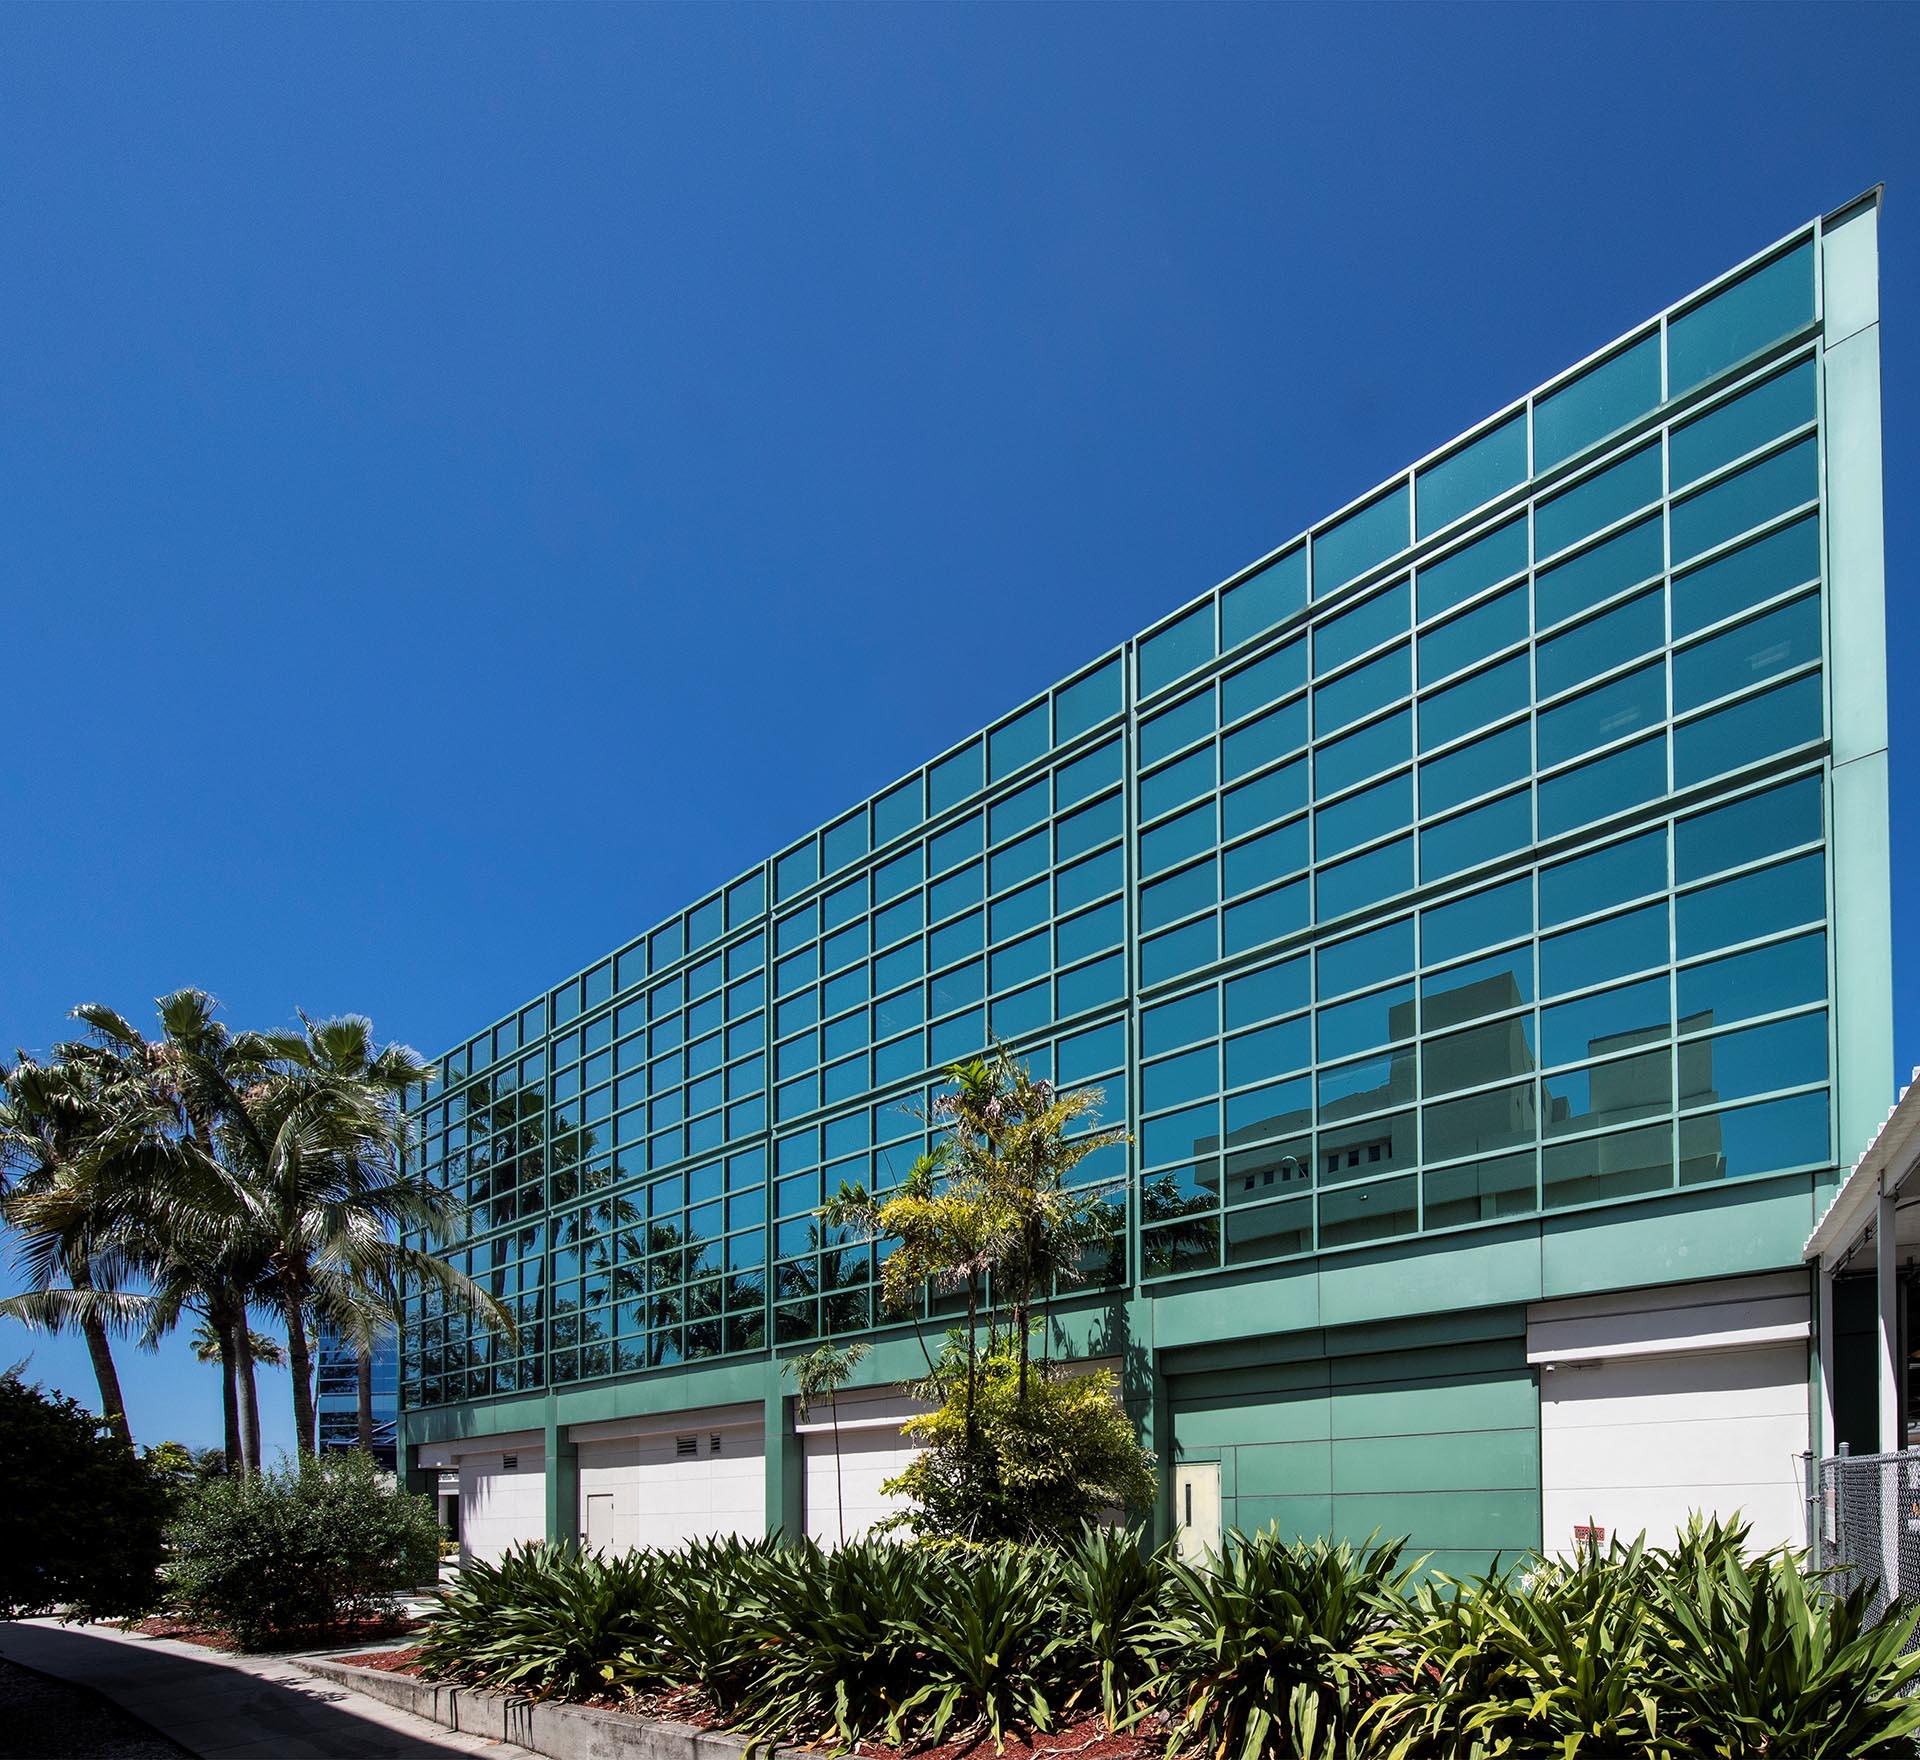 Mount Sinai Medical Center - RBB Inc